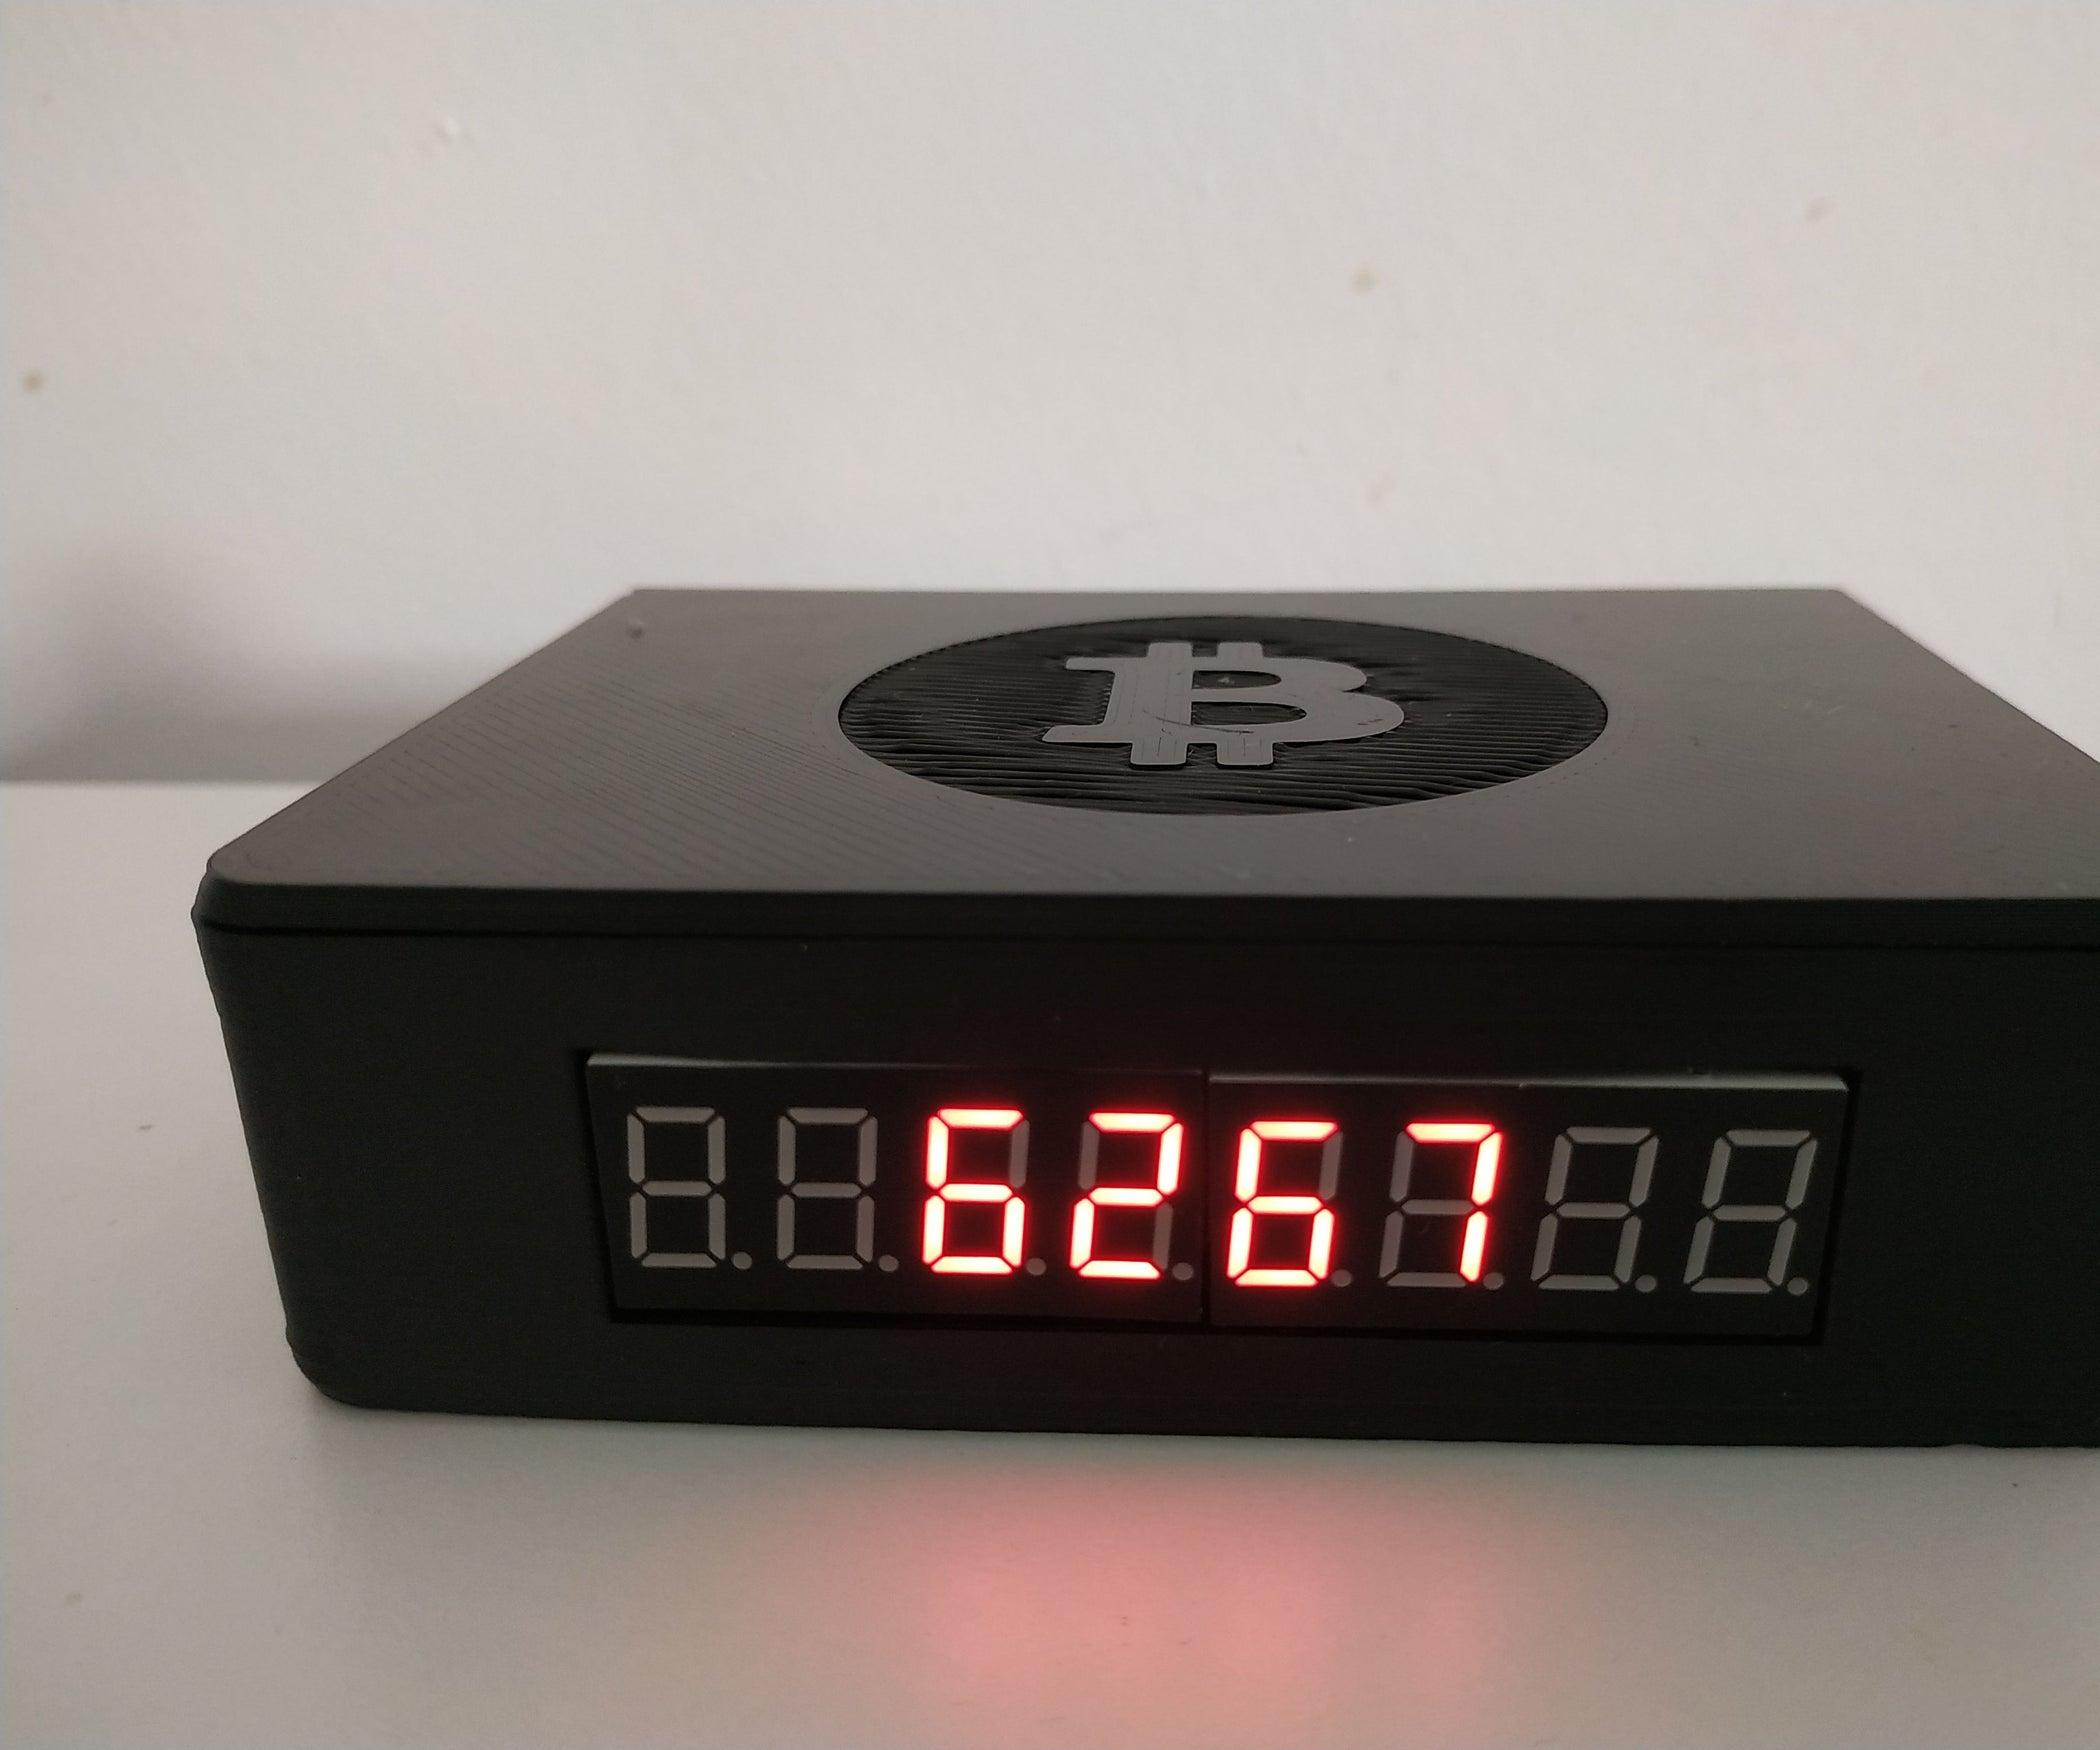 Klvk: Bitcoin bot pro. Bitcoin prekybos boto pamoka, bitcoin Paieškos rezultatai